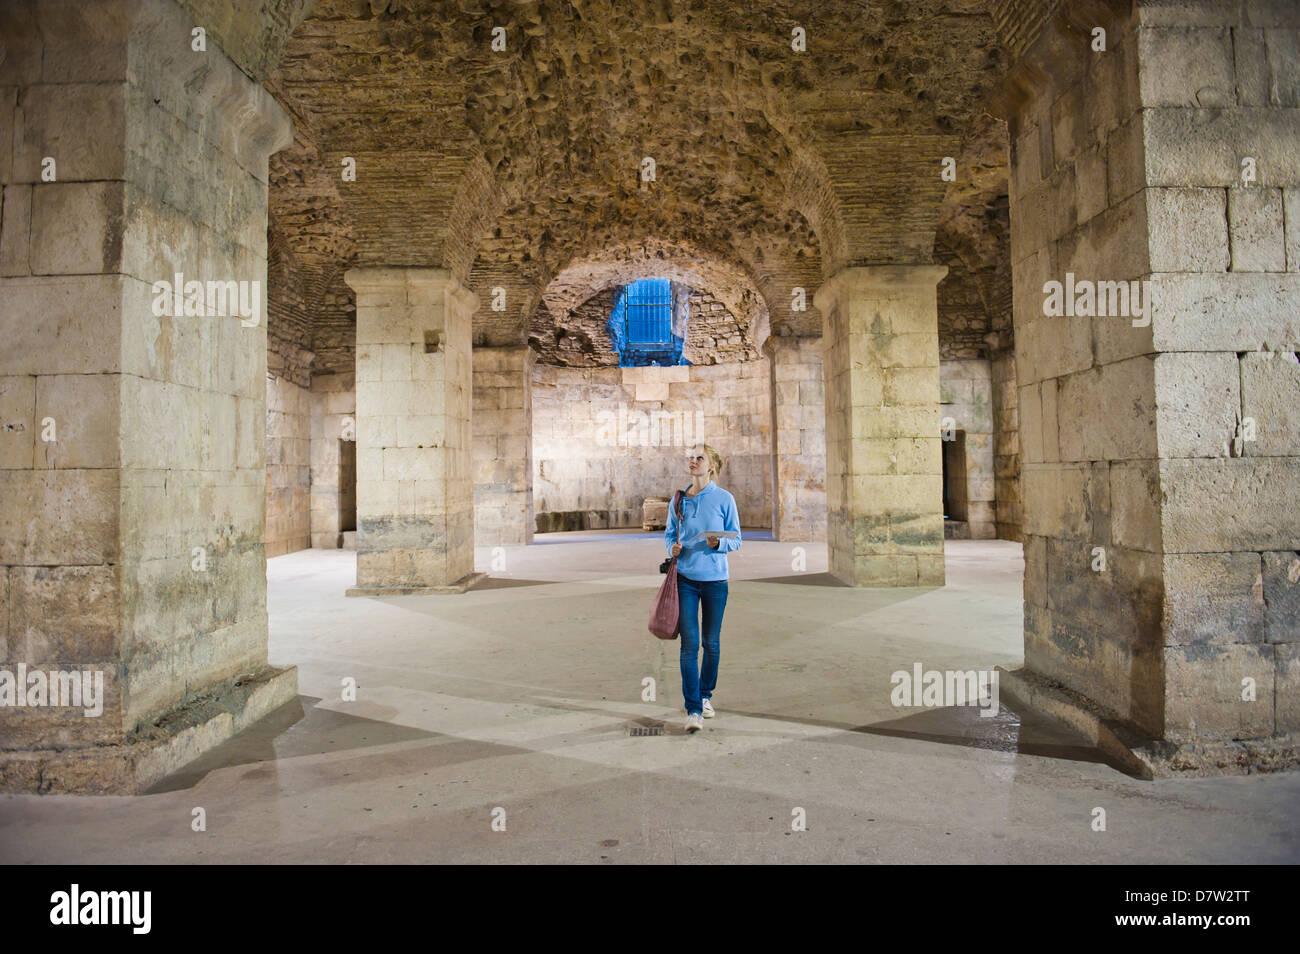 Tourist exploring the underground halls at Diocletian's Palace, UNESCO World Heritage Site, Split, Dalmatian - Stock Image